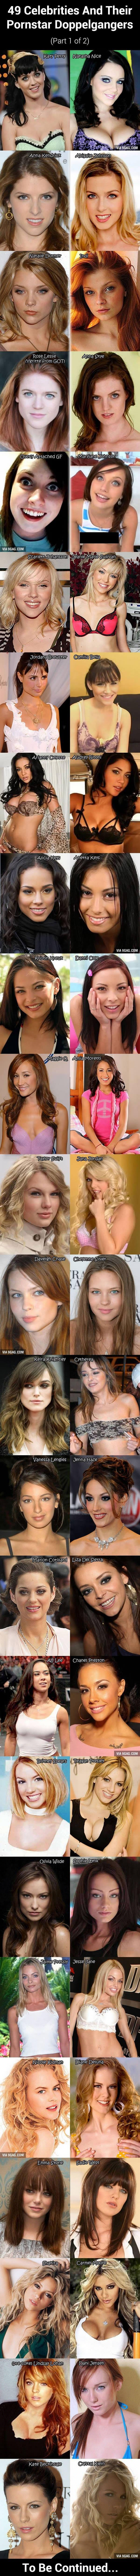 celebrities and pornstars look alike. ur welkum.. Wait. You're telling me not both of these are pornstas...?